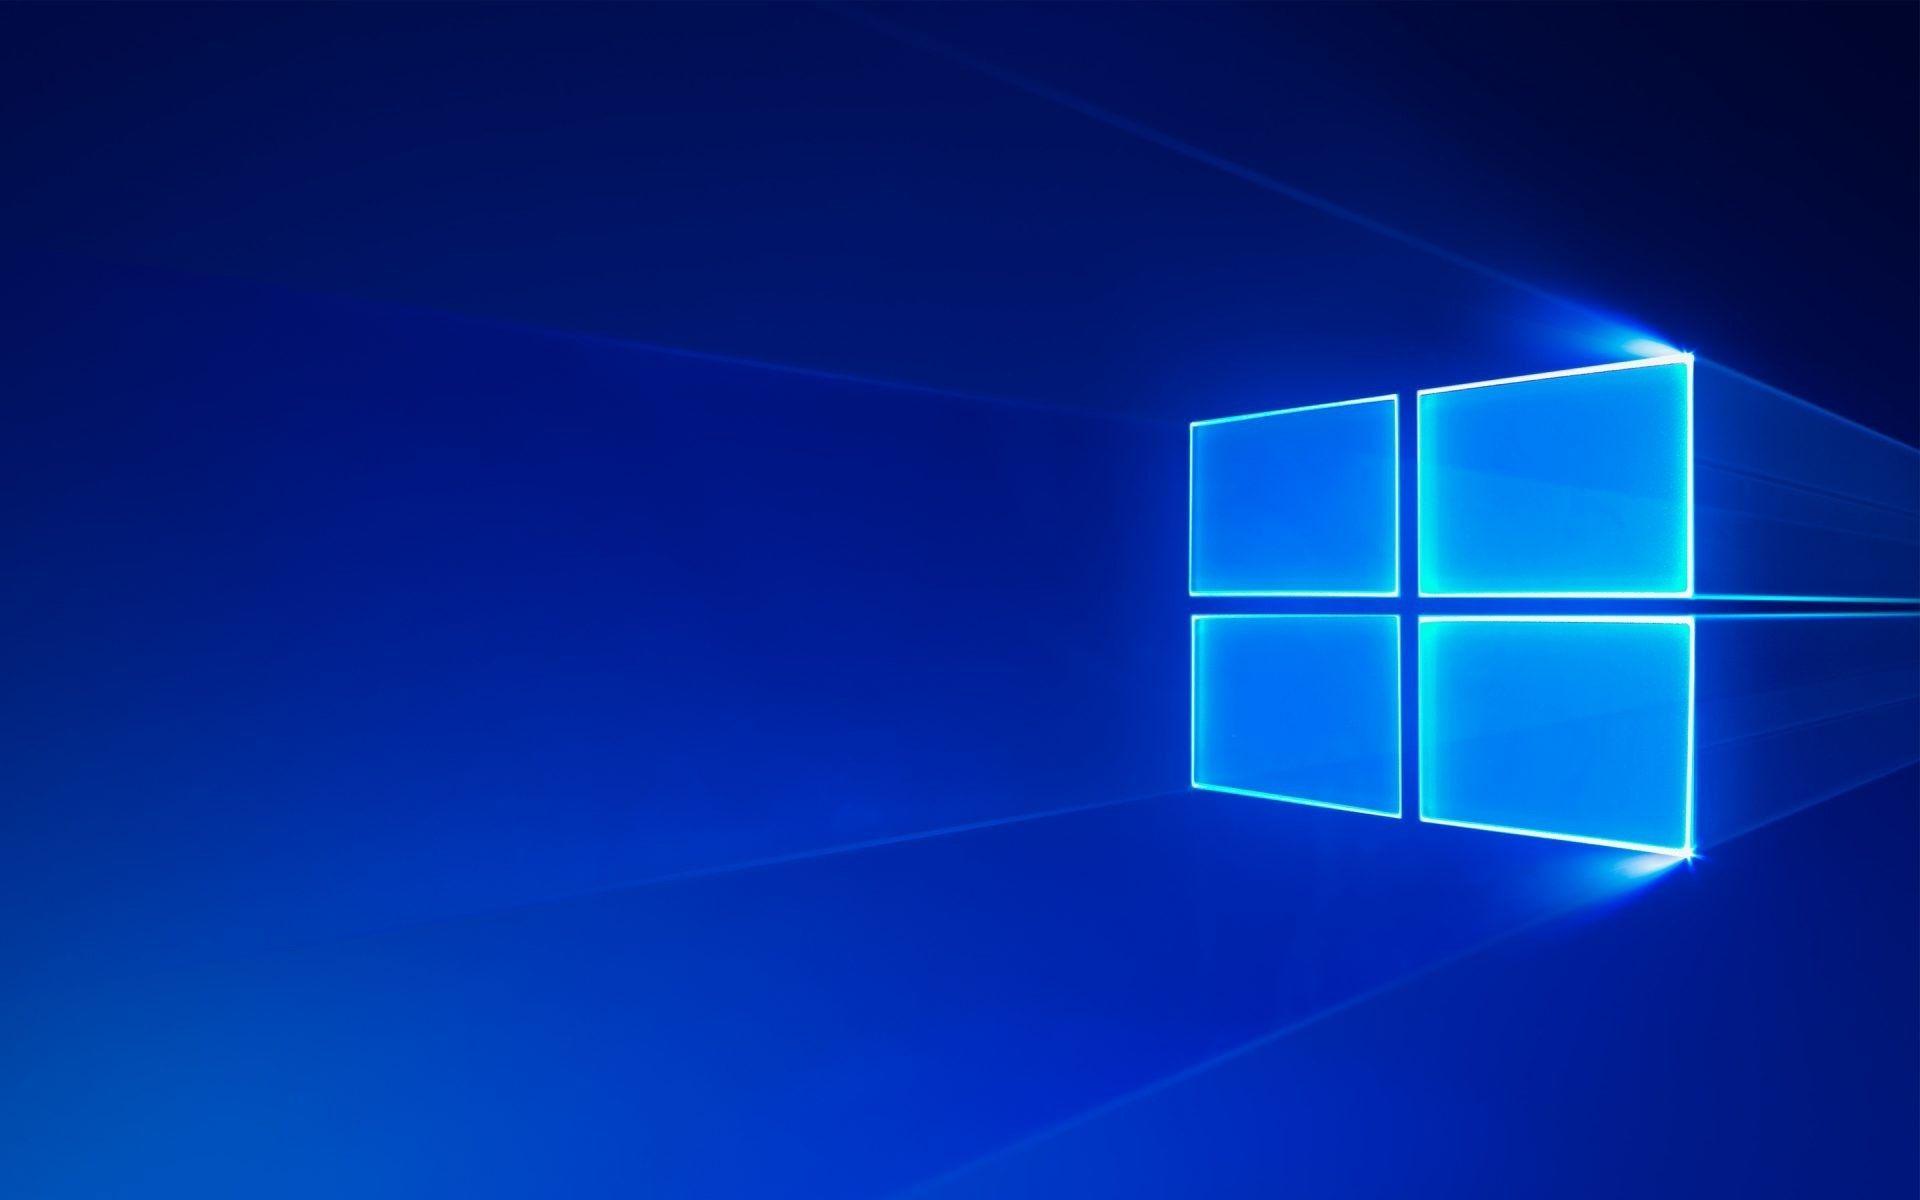 Fresh Windows 10 4k Ultra Hd Wallpapers Windows 10 Wallpaper Windows 10 Ultra Hd Wallpaper